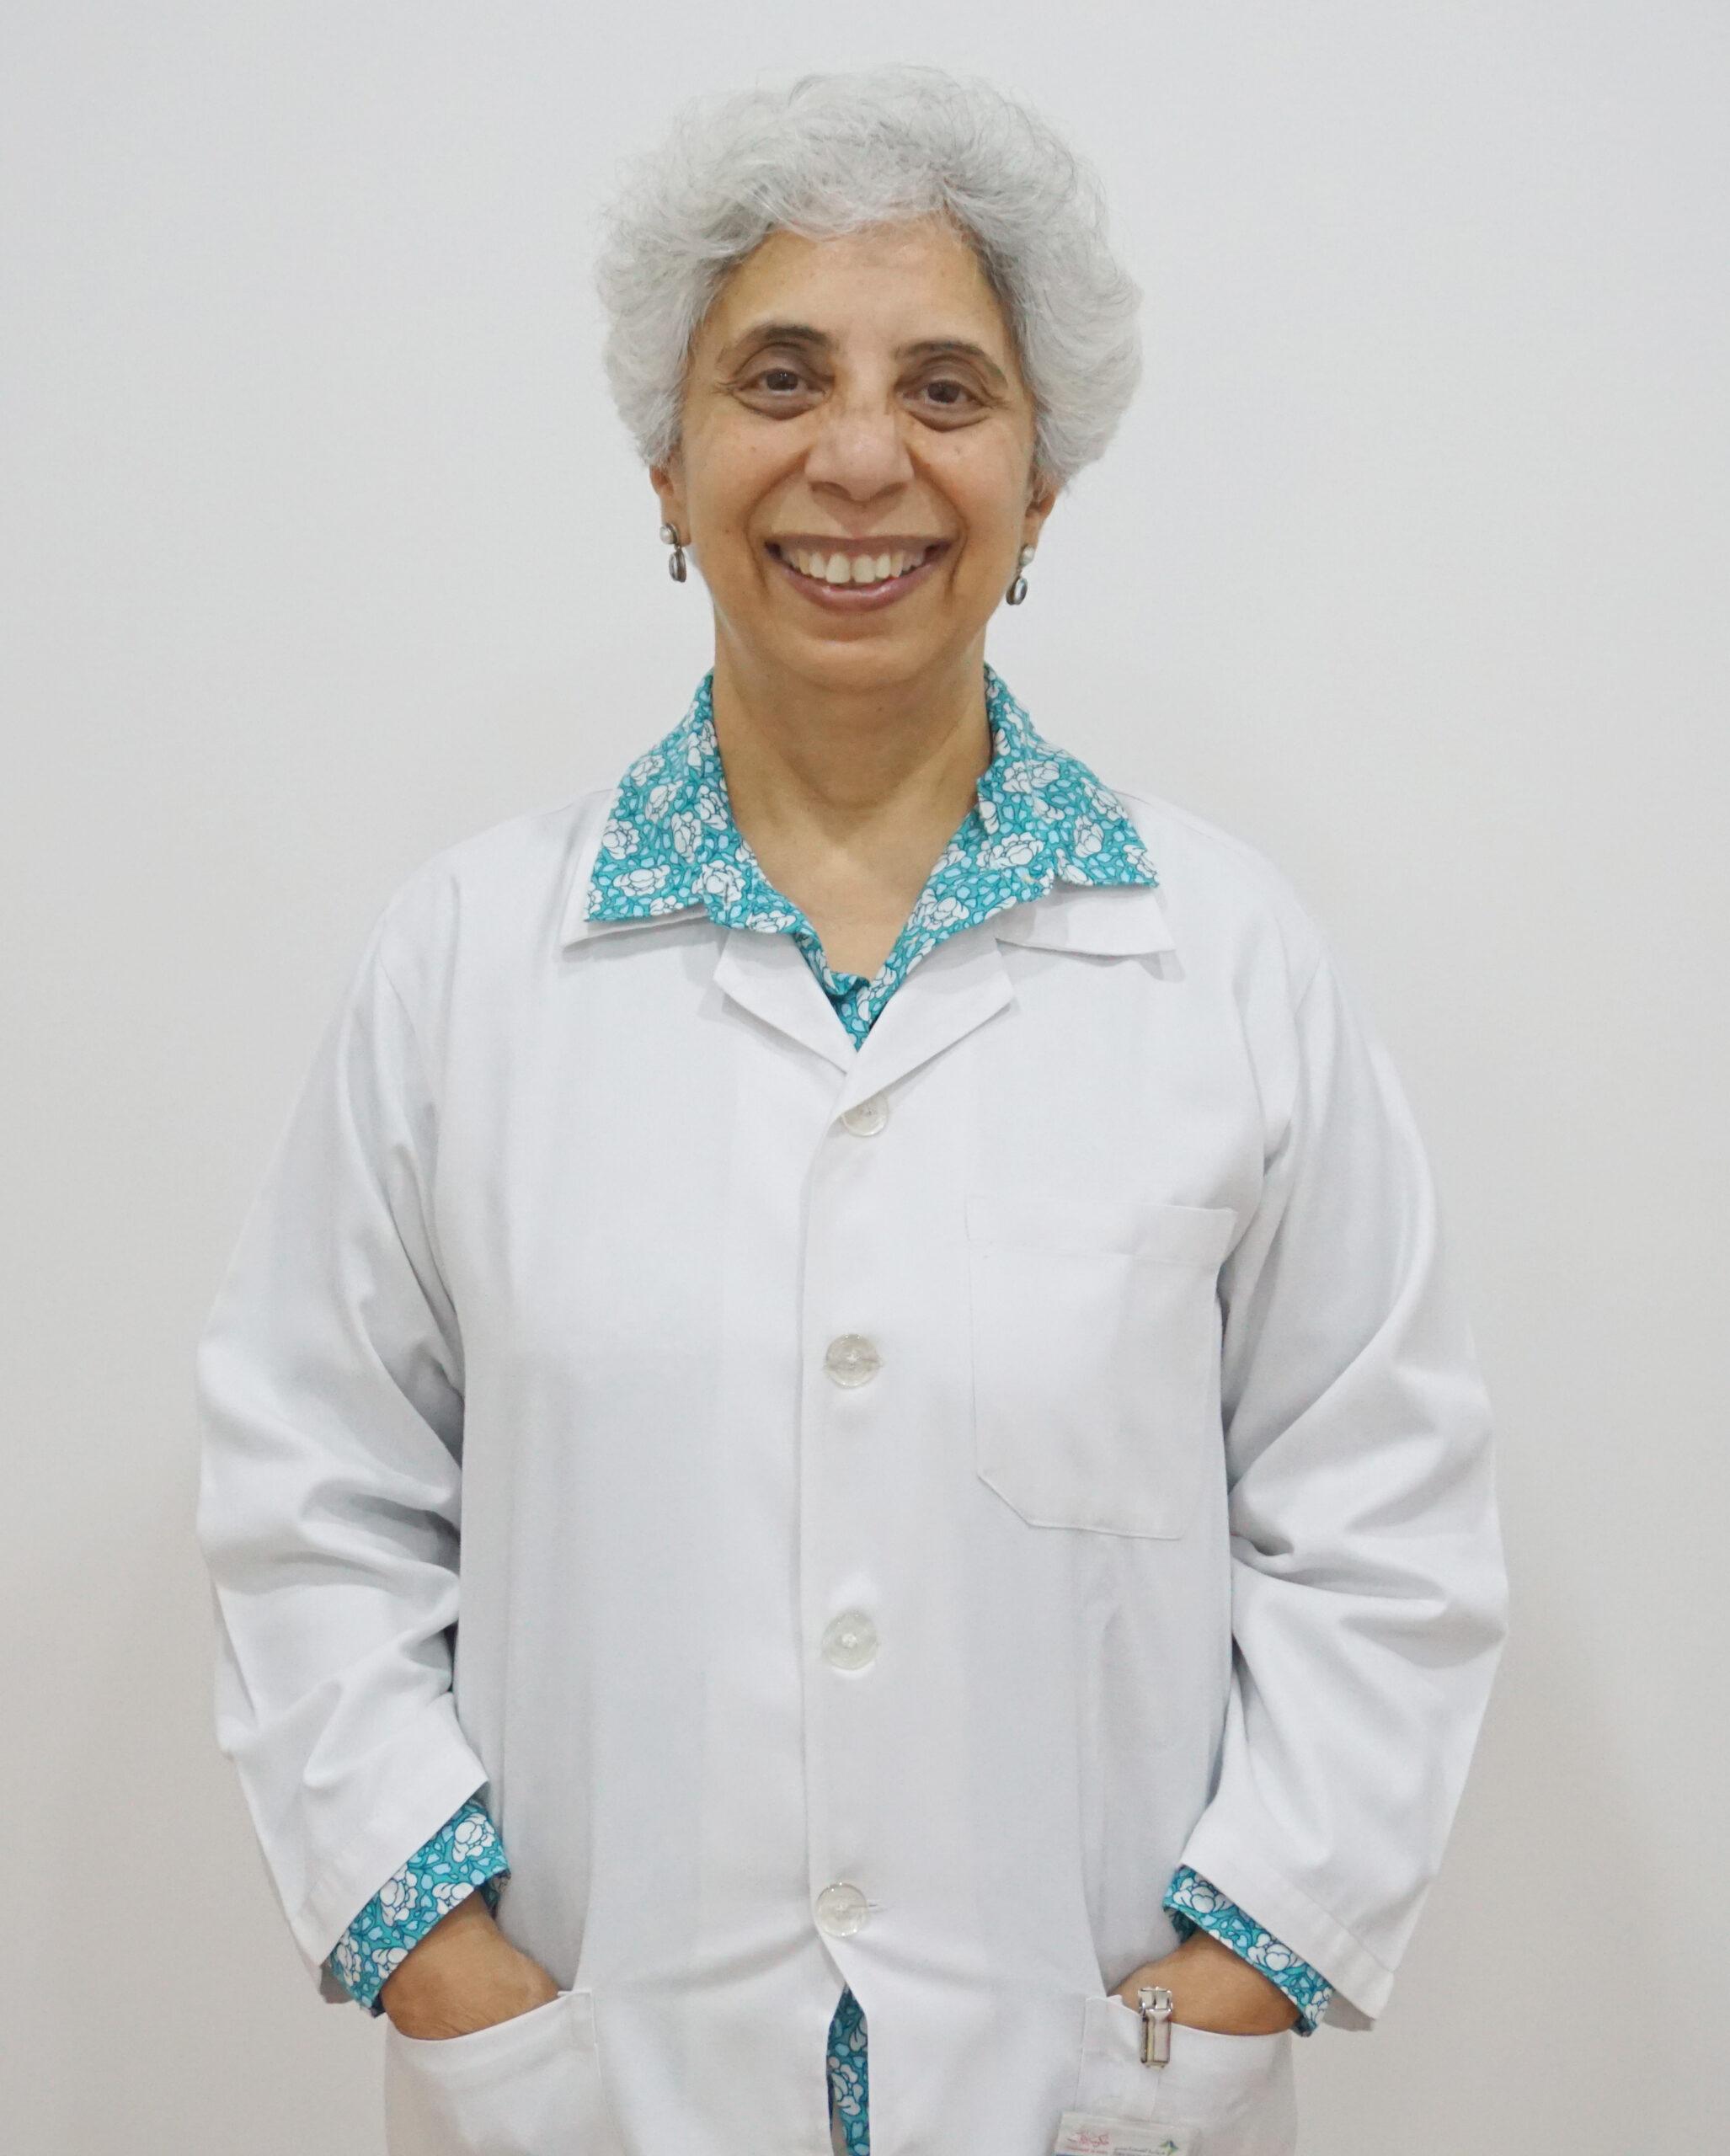 Vaneeta Shahani